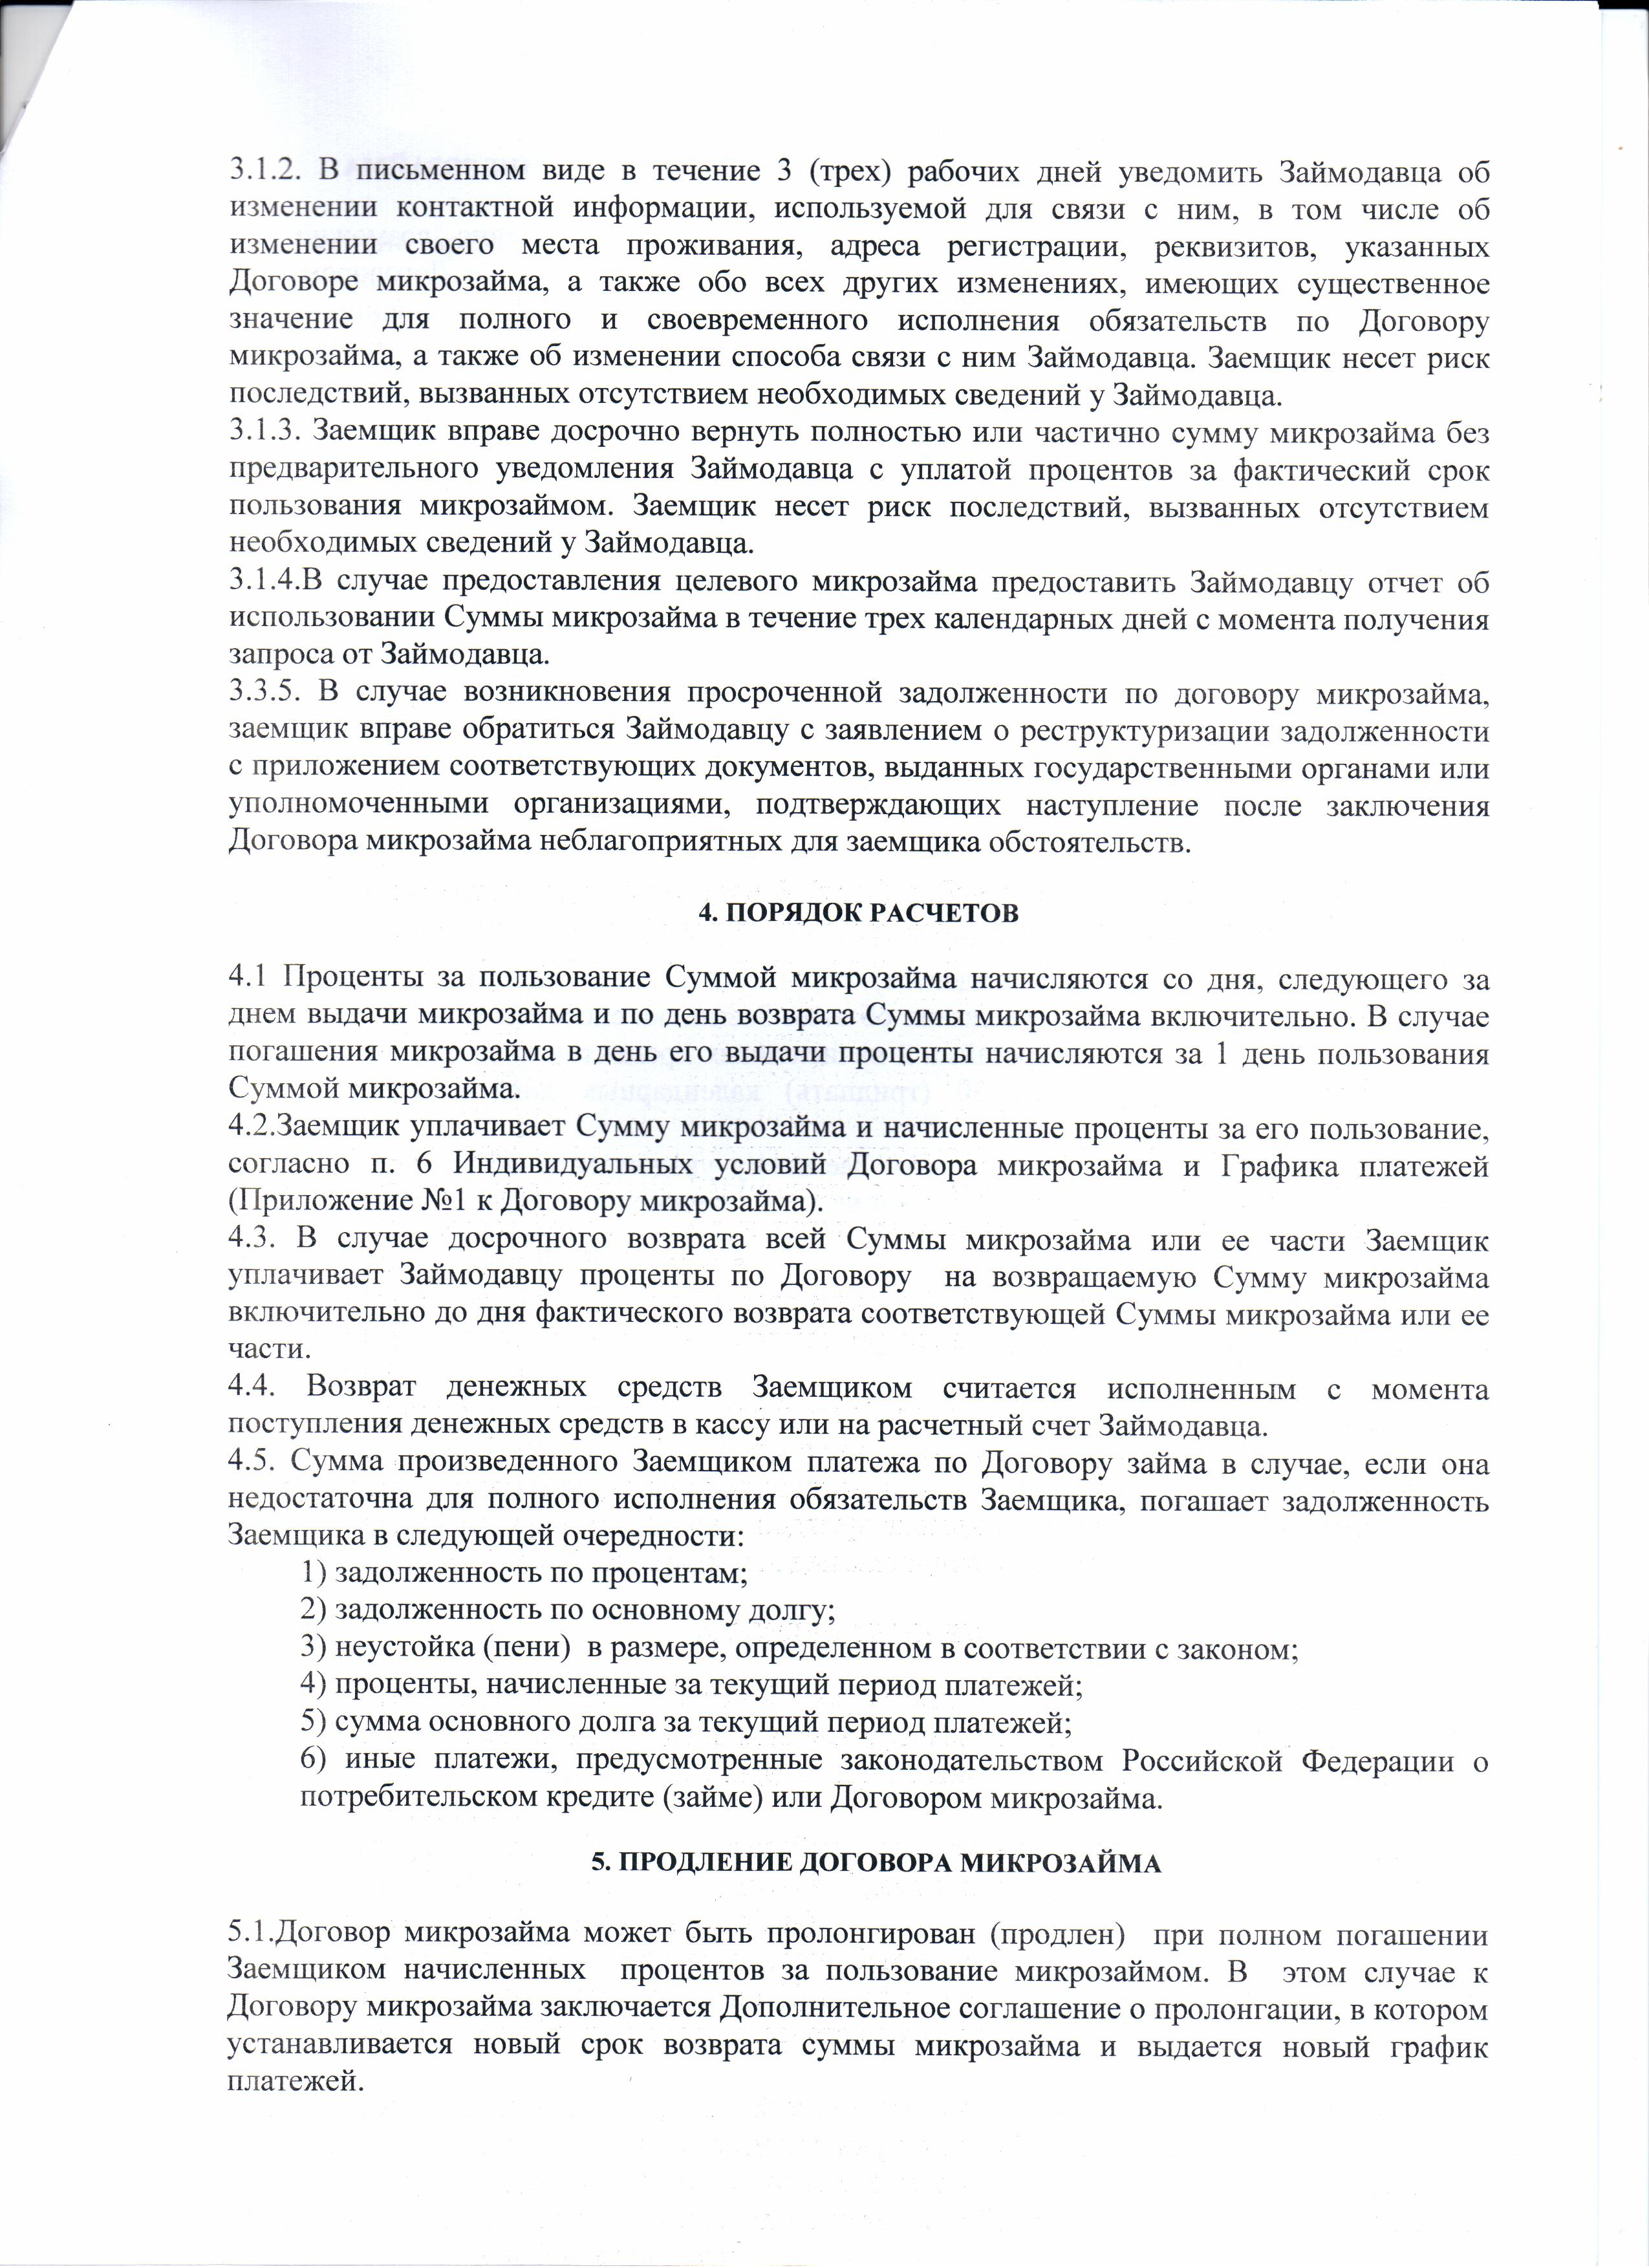 Общие условия договора микрозайма стр3